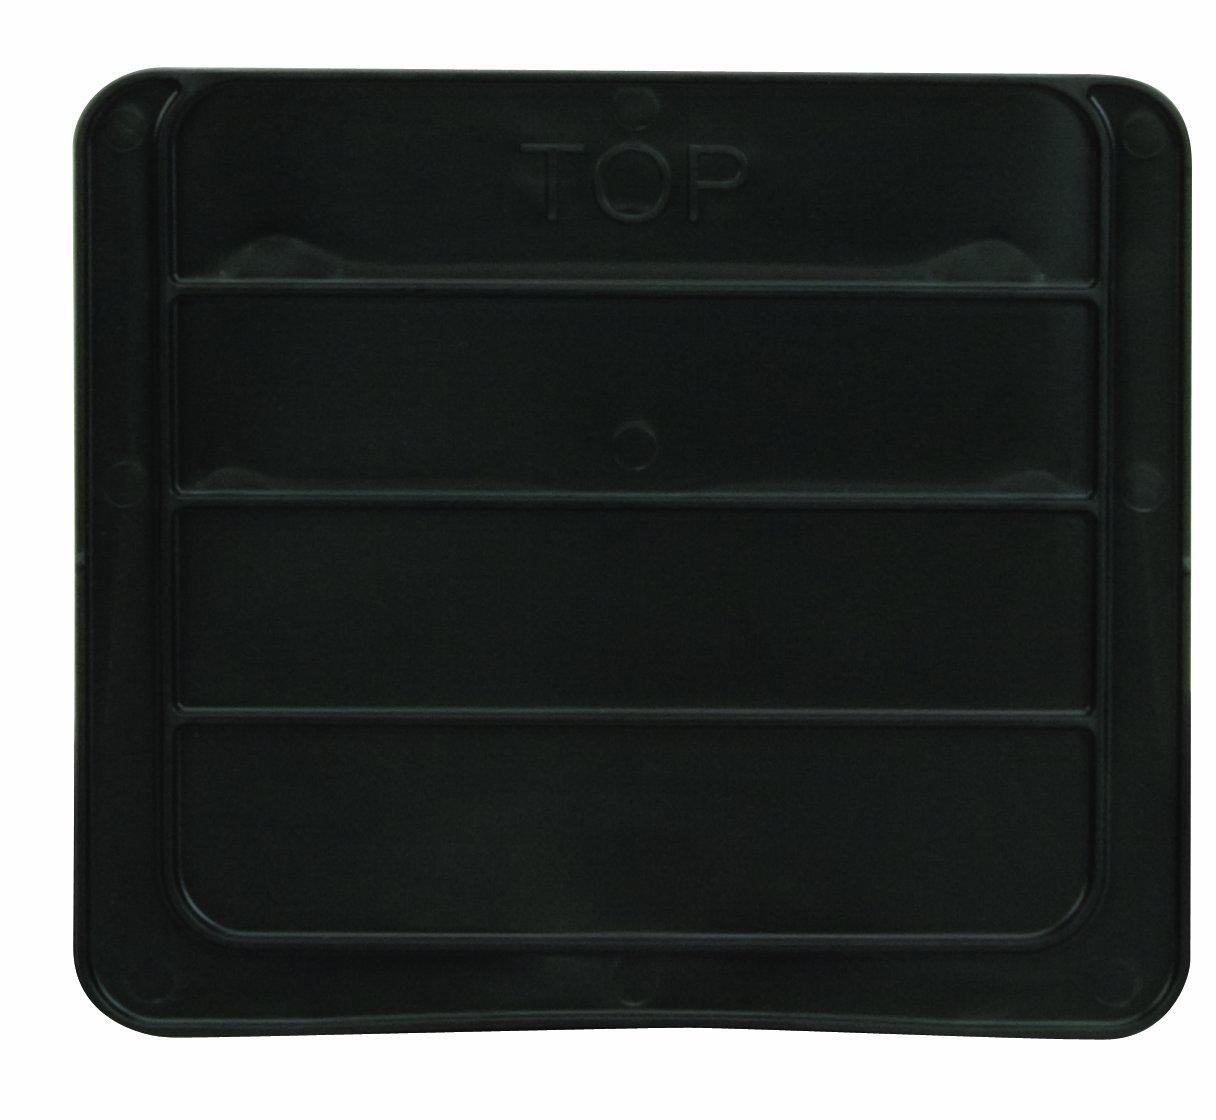 akro-mils 41289 Widthwise Divider 30289 SuperサイズAkroBin、2のパッケージ、ブラック B003FLLPN2